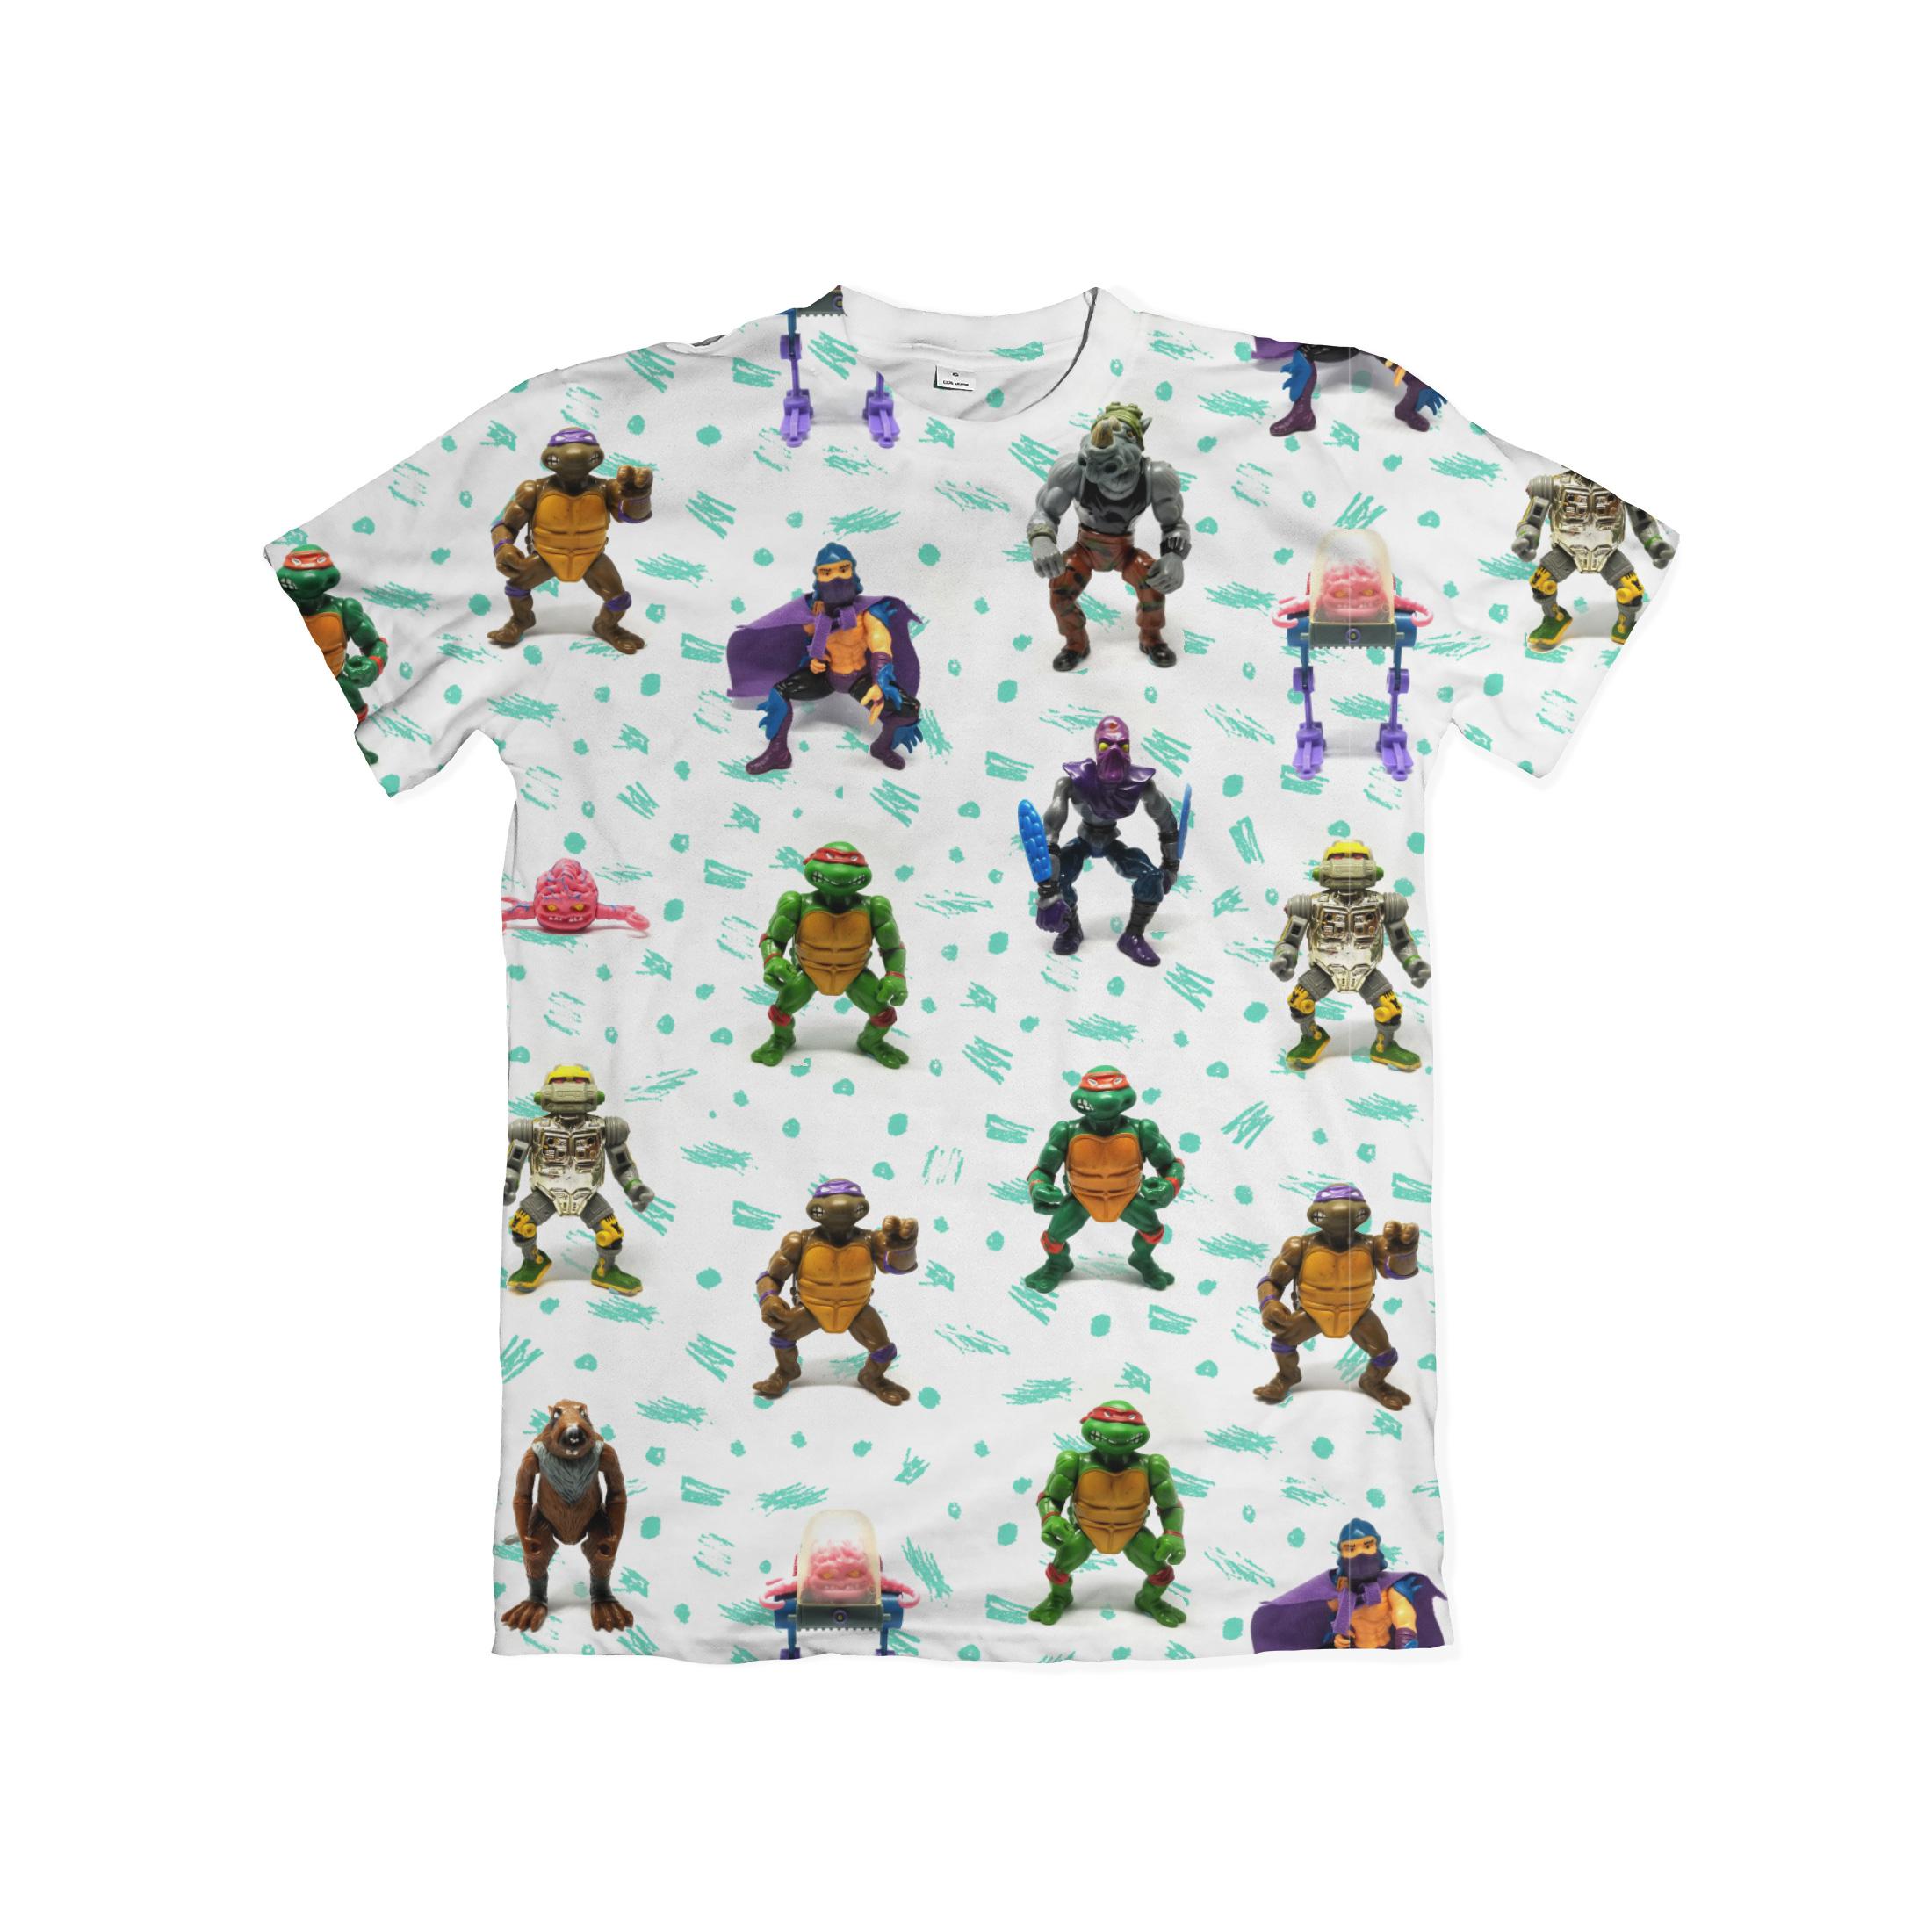 tmnt-shirt.jpg